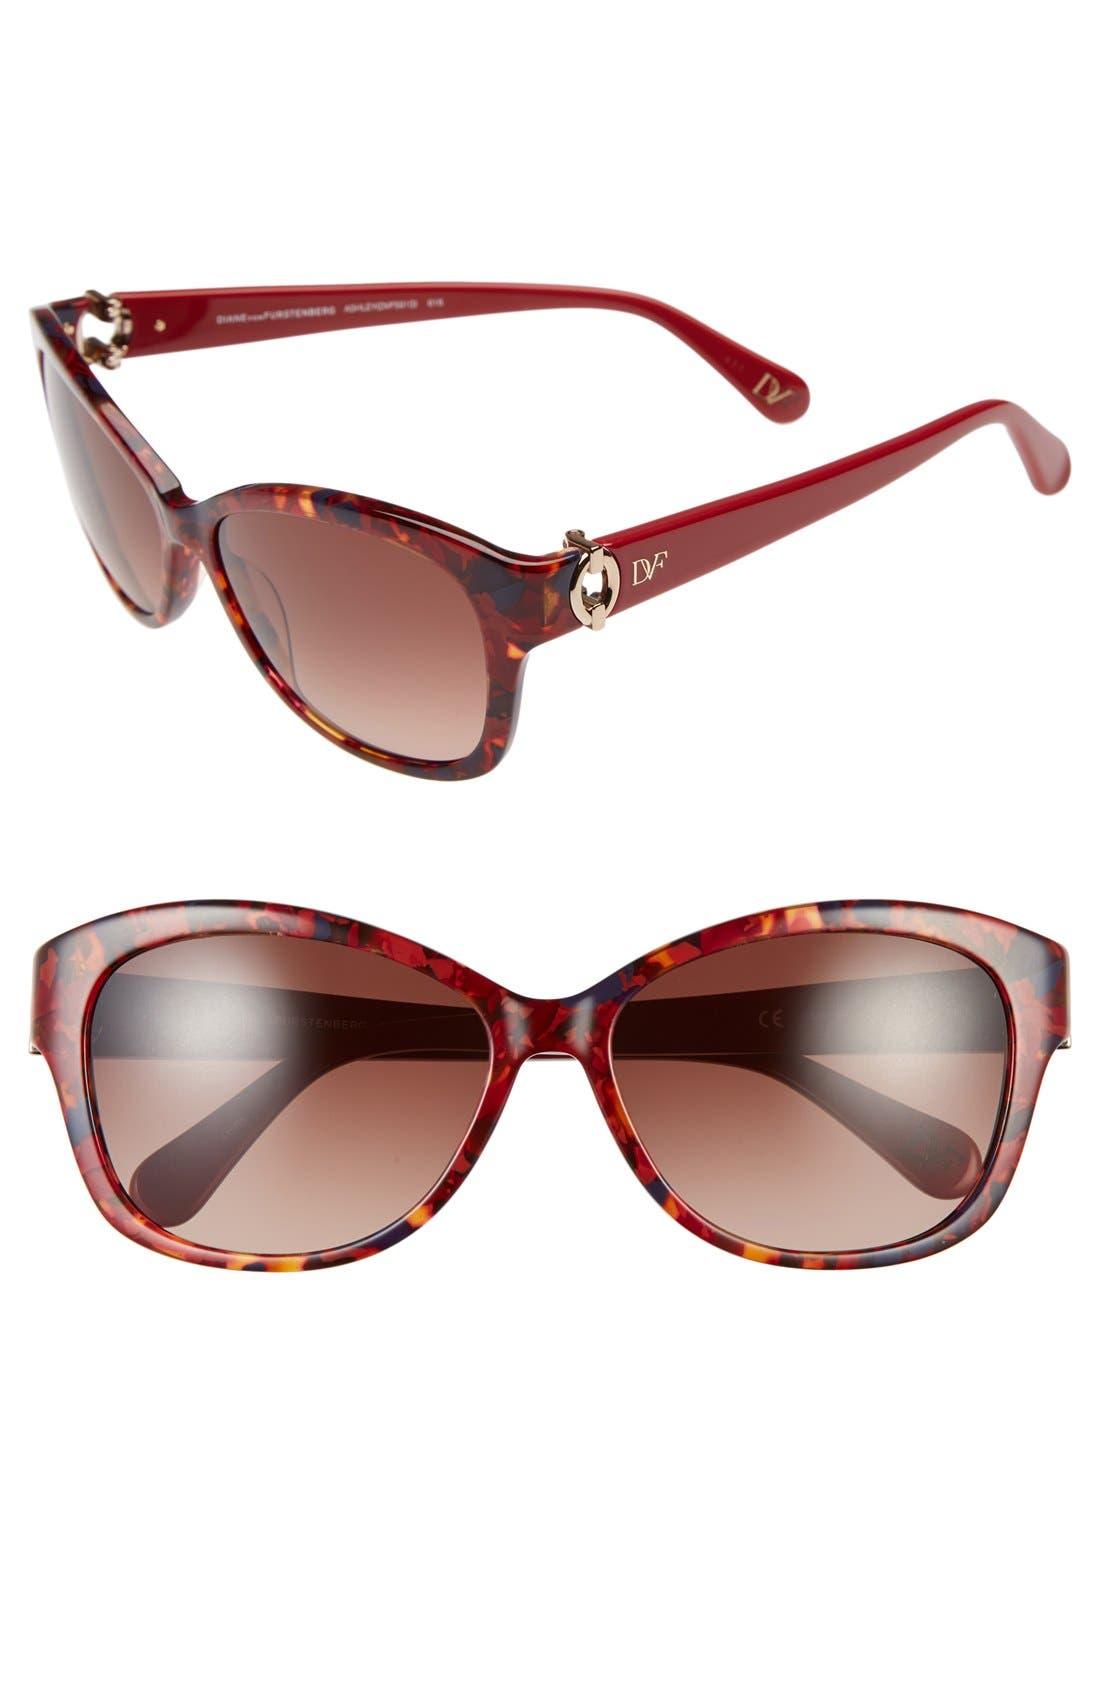 Main Image - Diane von Furstenberg 'Ashley' 58mm Sunglasses